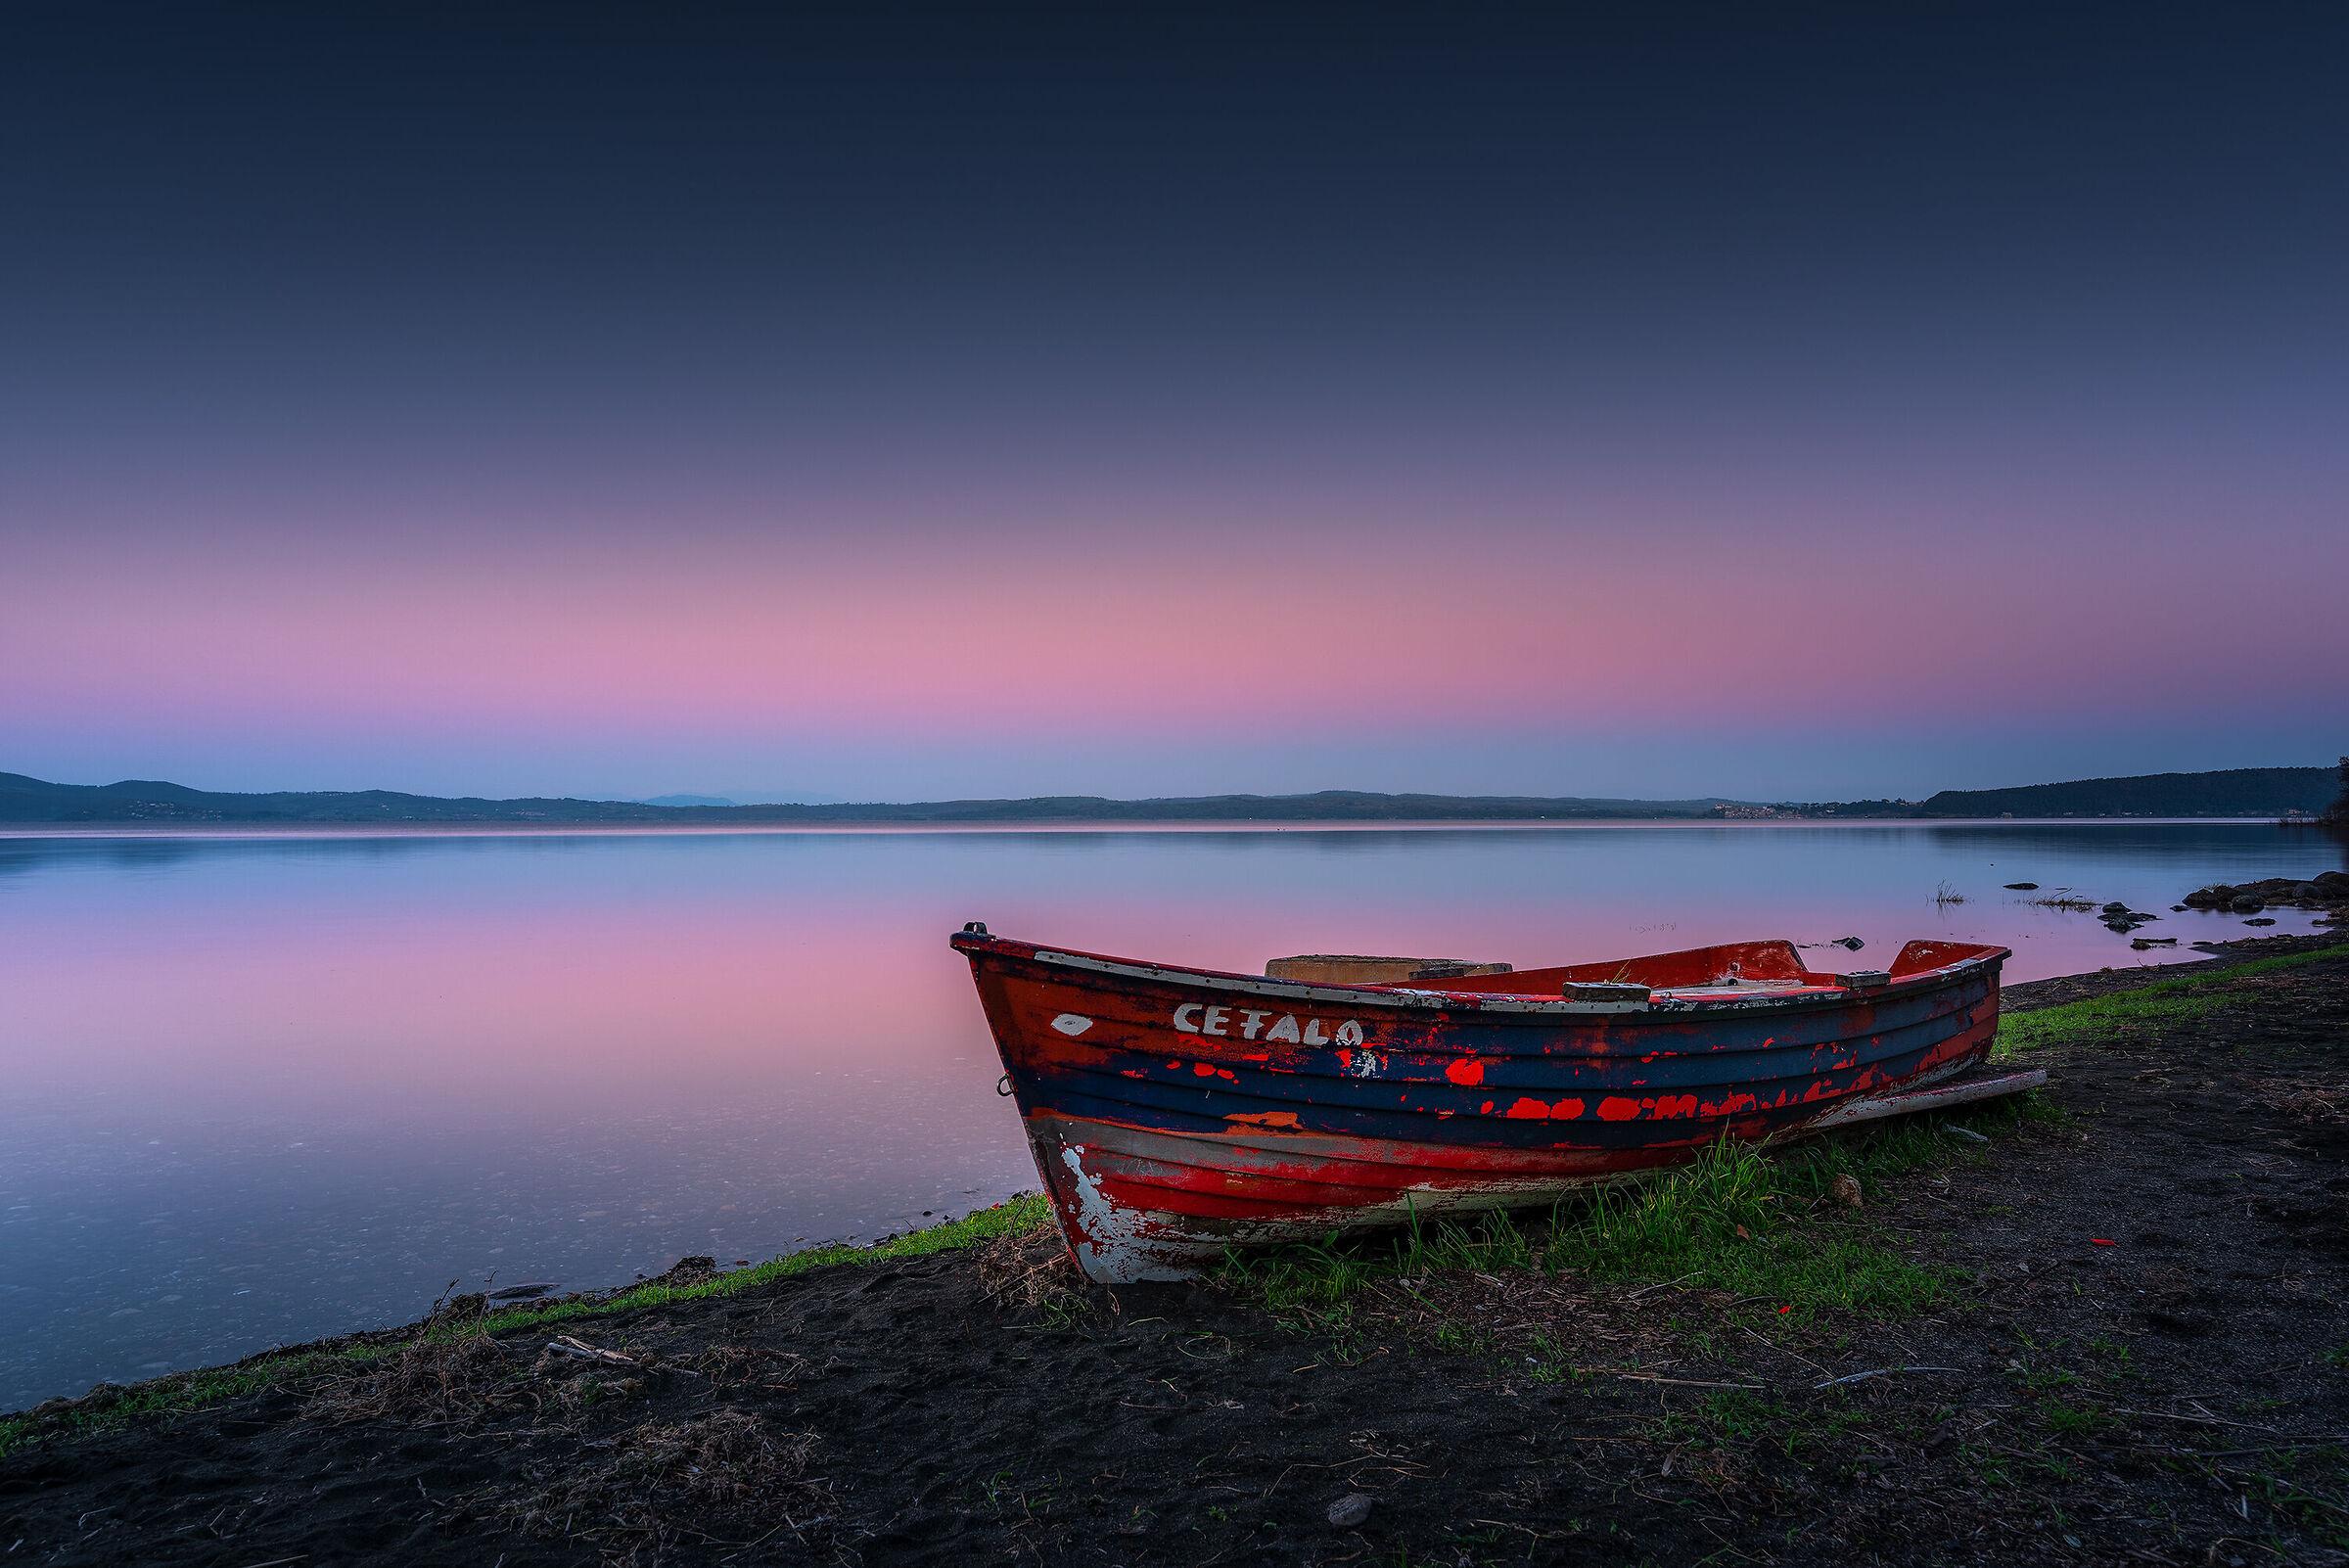 Blue Hour at Lake Bracciano...